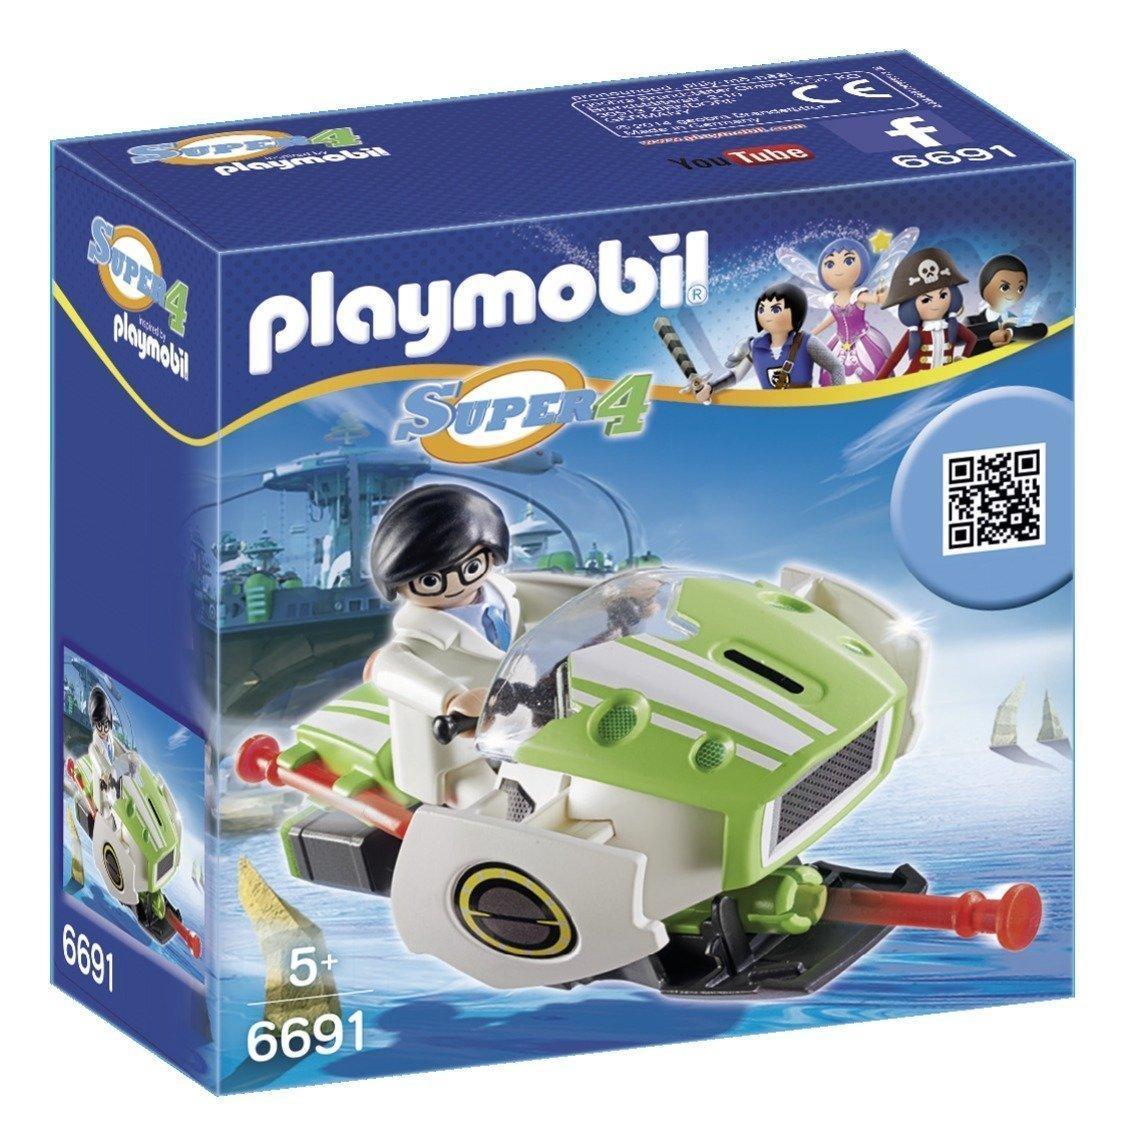 [Premium] Playmobil - A1505517 - Sky Jet - Super4